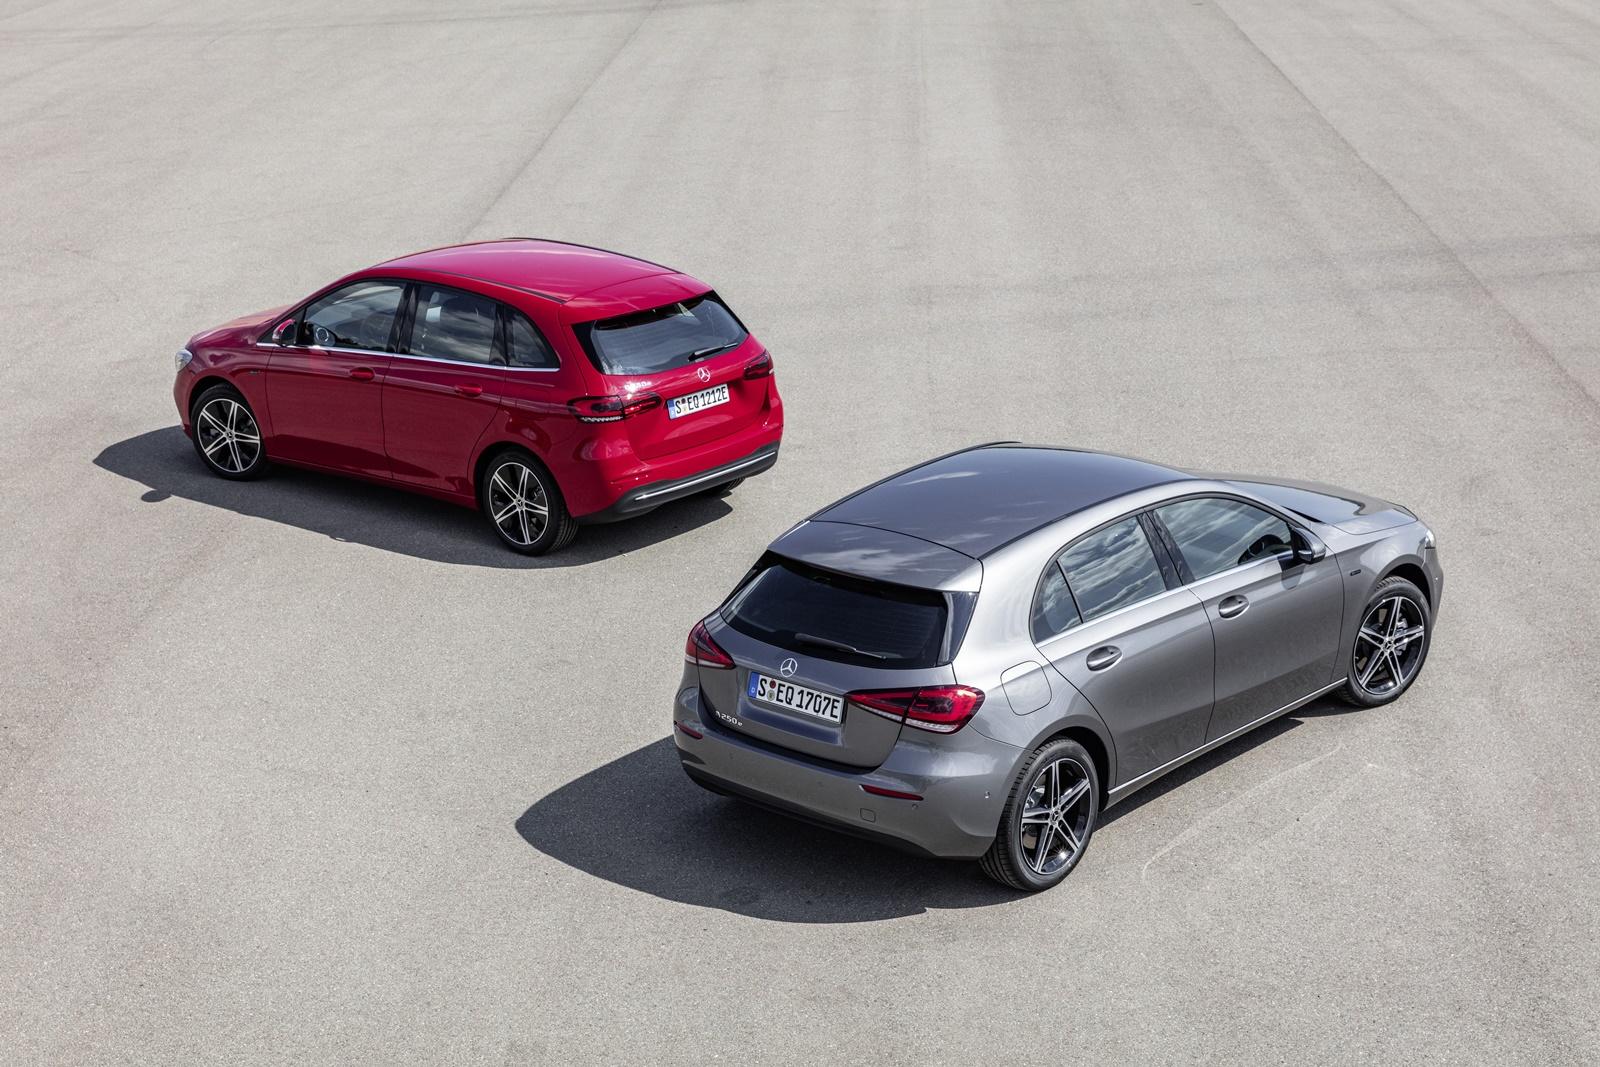 Mercedes-Benz Plug-in-Hybrid A 250 e & Mercedes-Benz Plug-in-Hybrid B 250 e